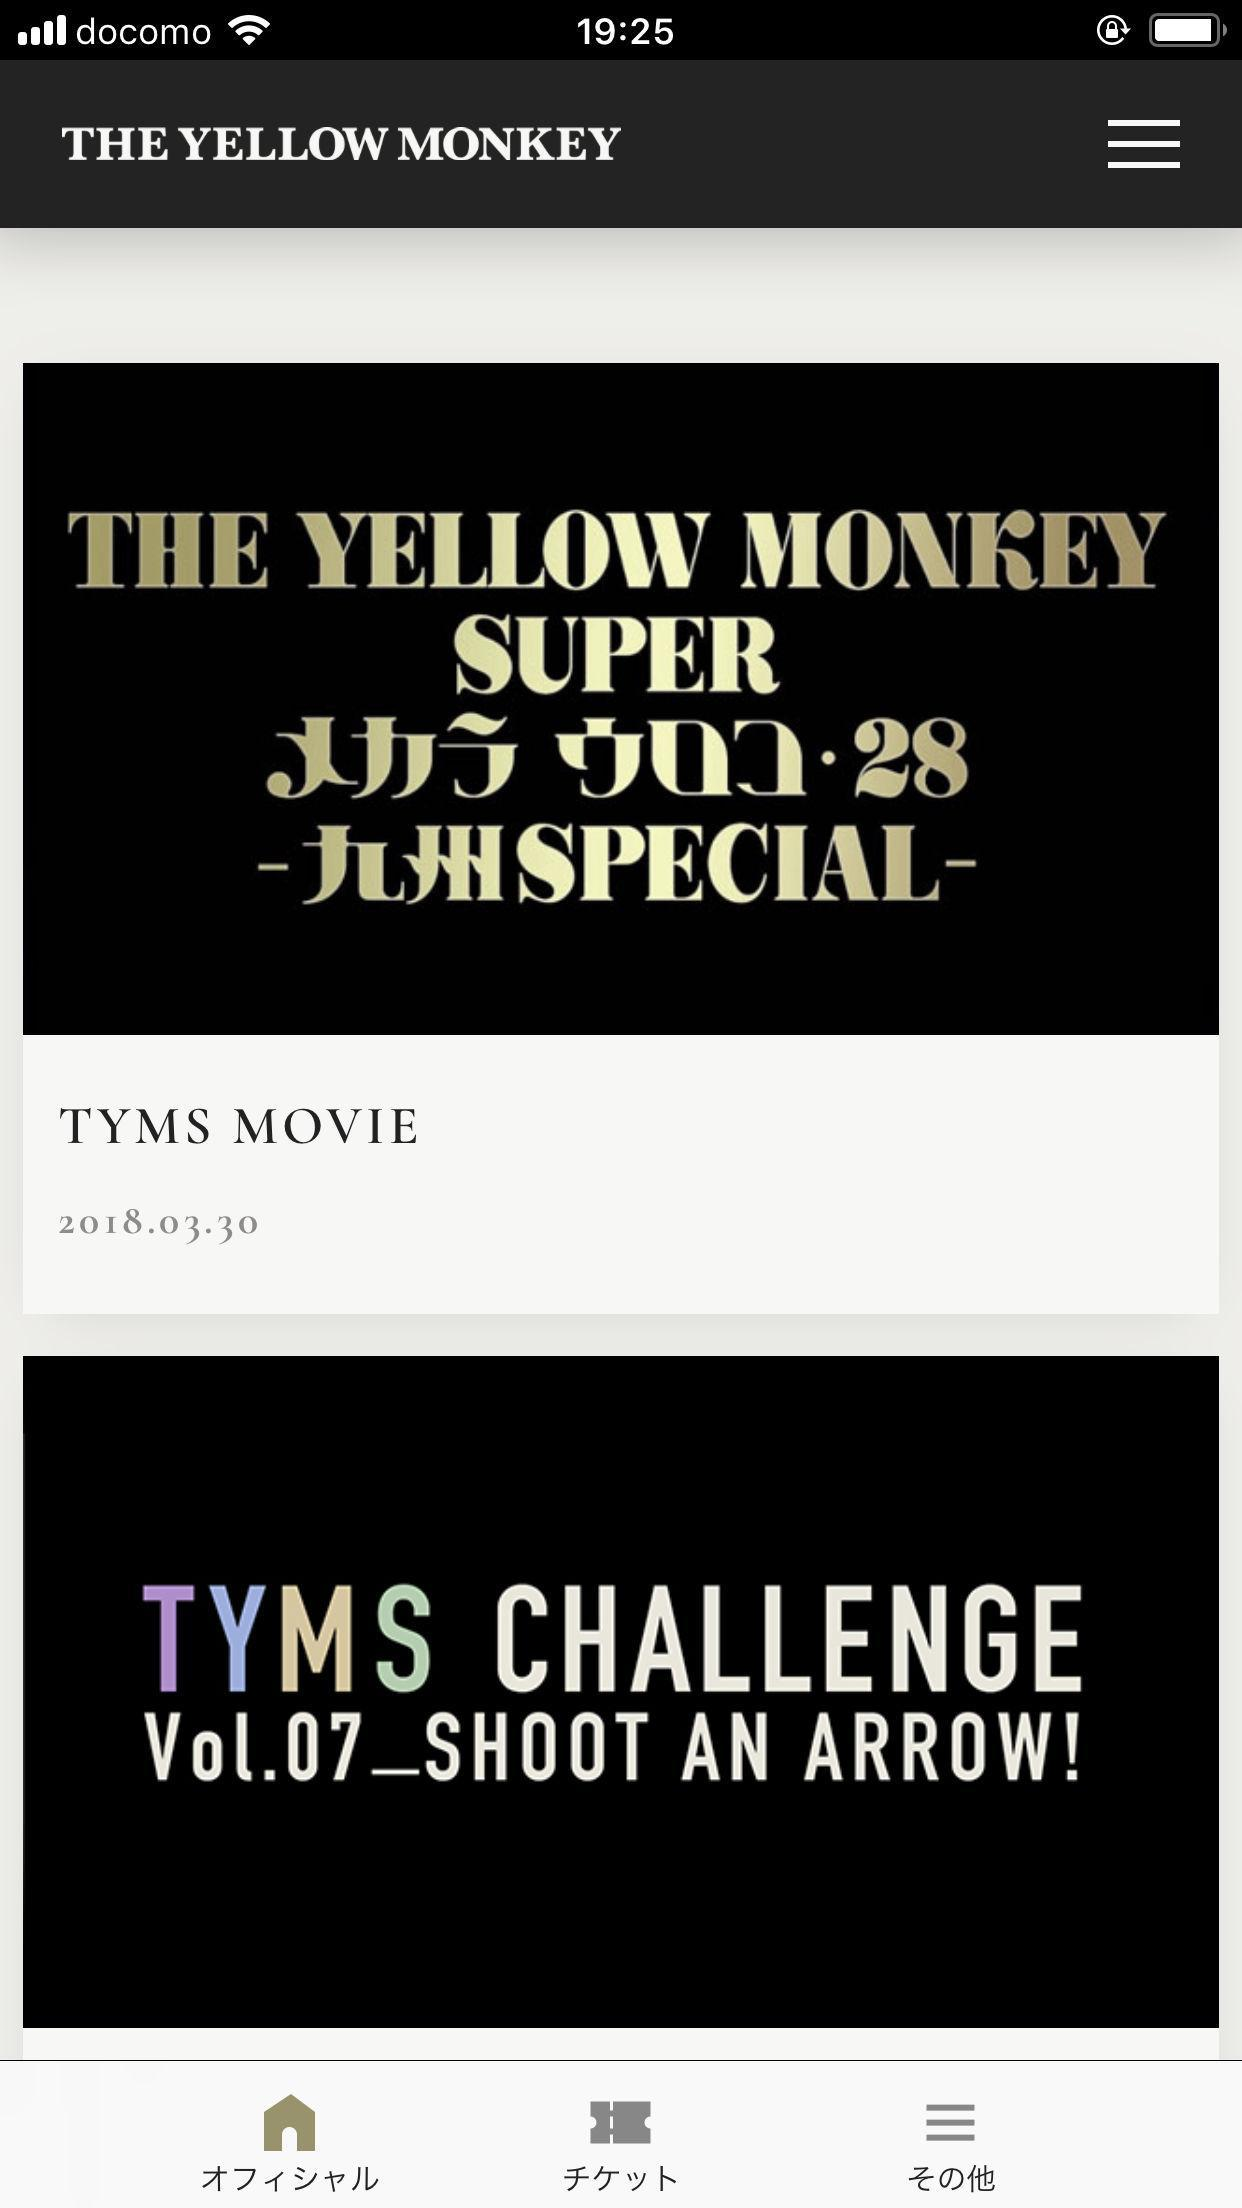 Android 用の The Yellow Monkey Apk をダウンロード